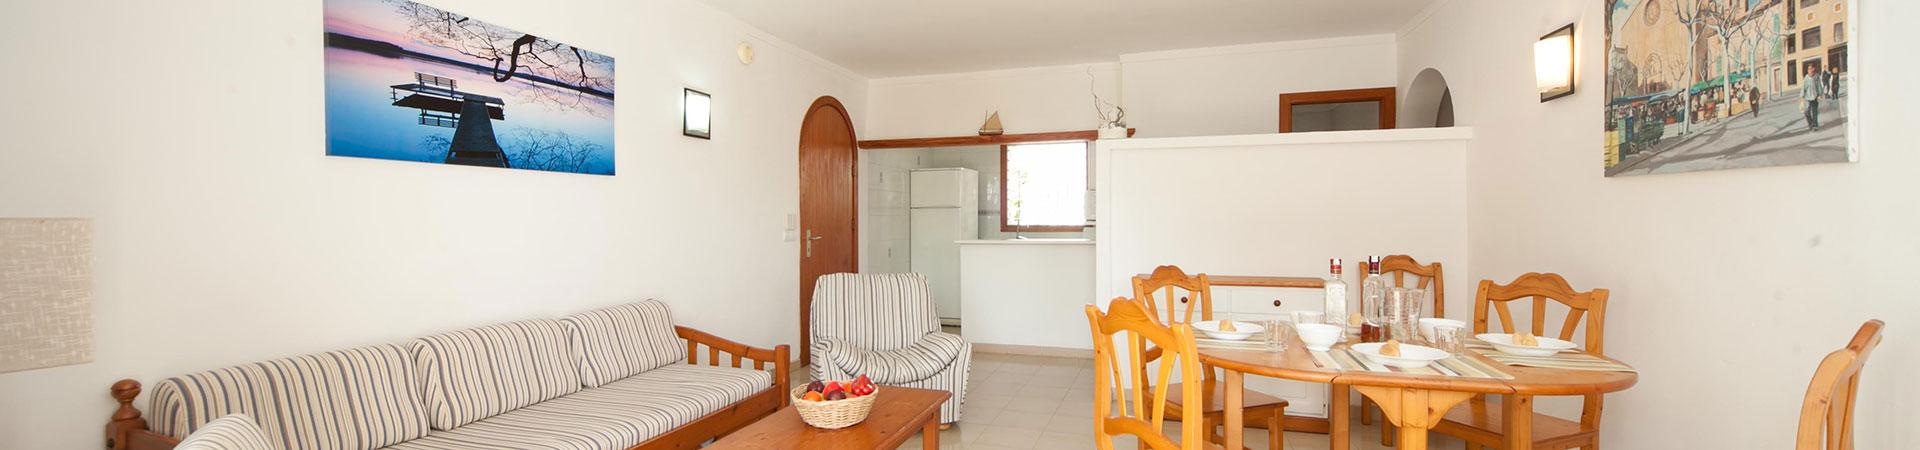 Apartamentos LEO Tourist services Puerto de Pollensa Balears, Illes